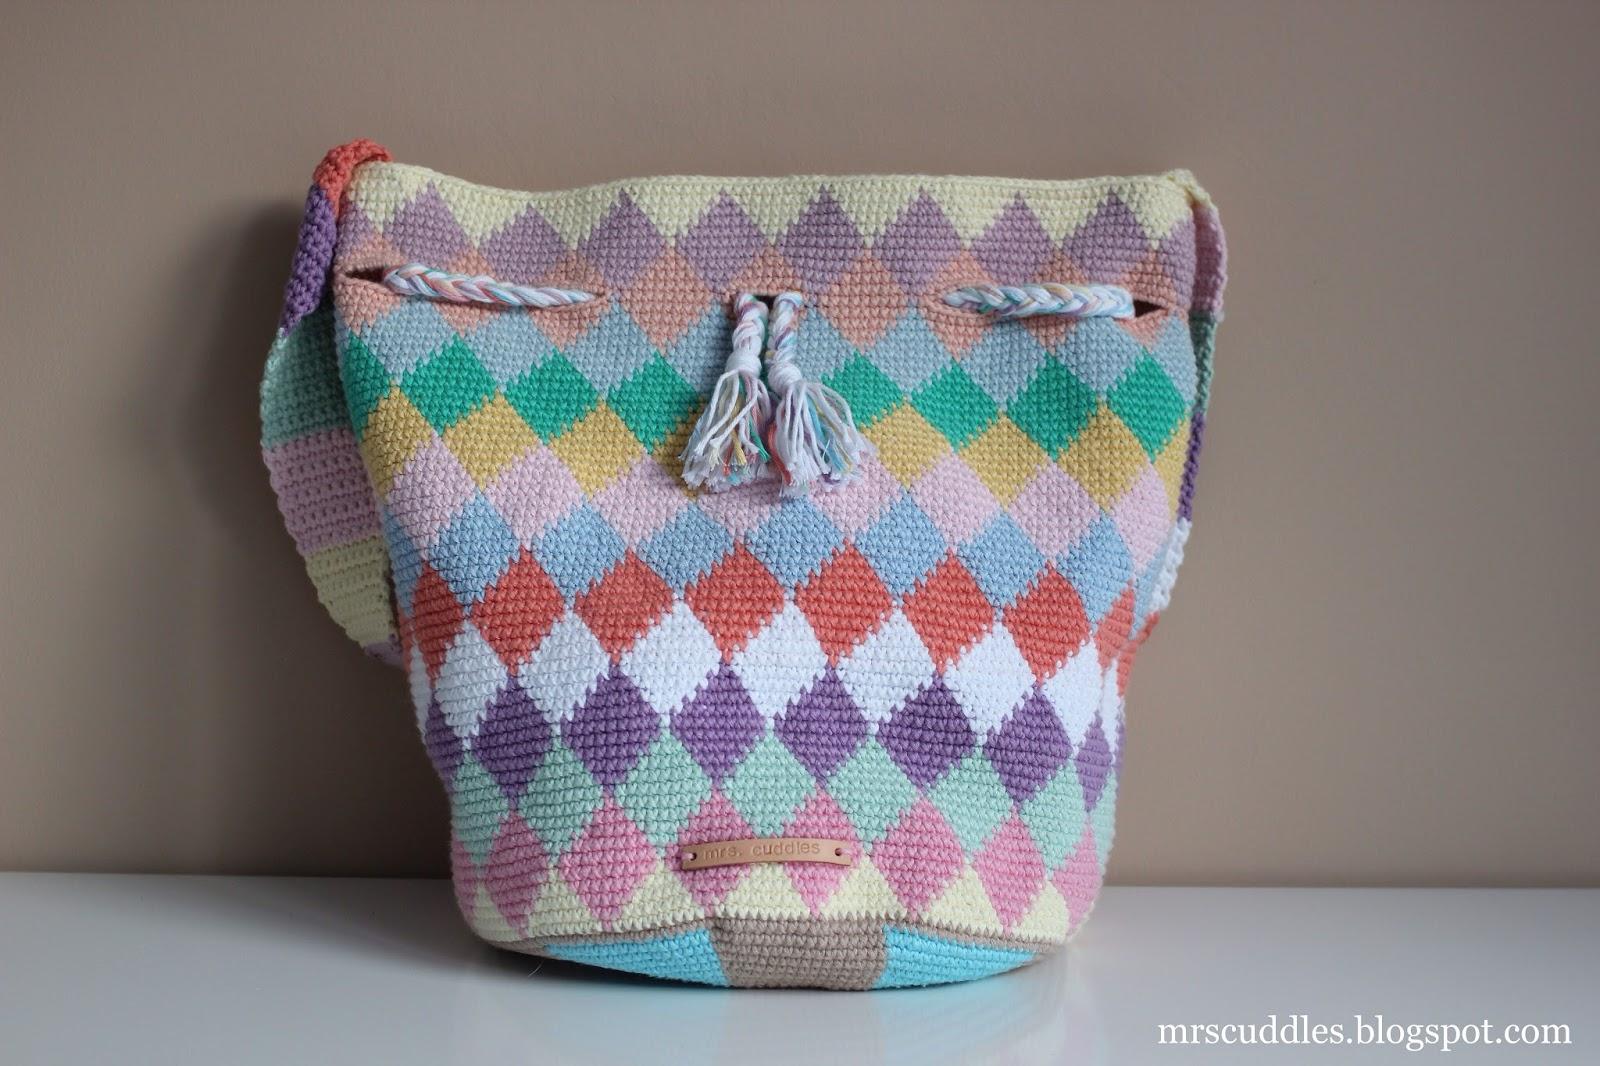 Mrs Cuddles Diamond Tapestry Bag